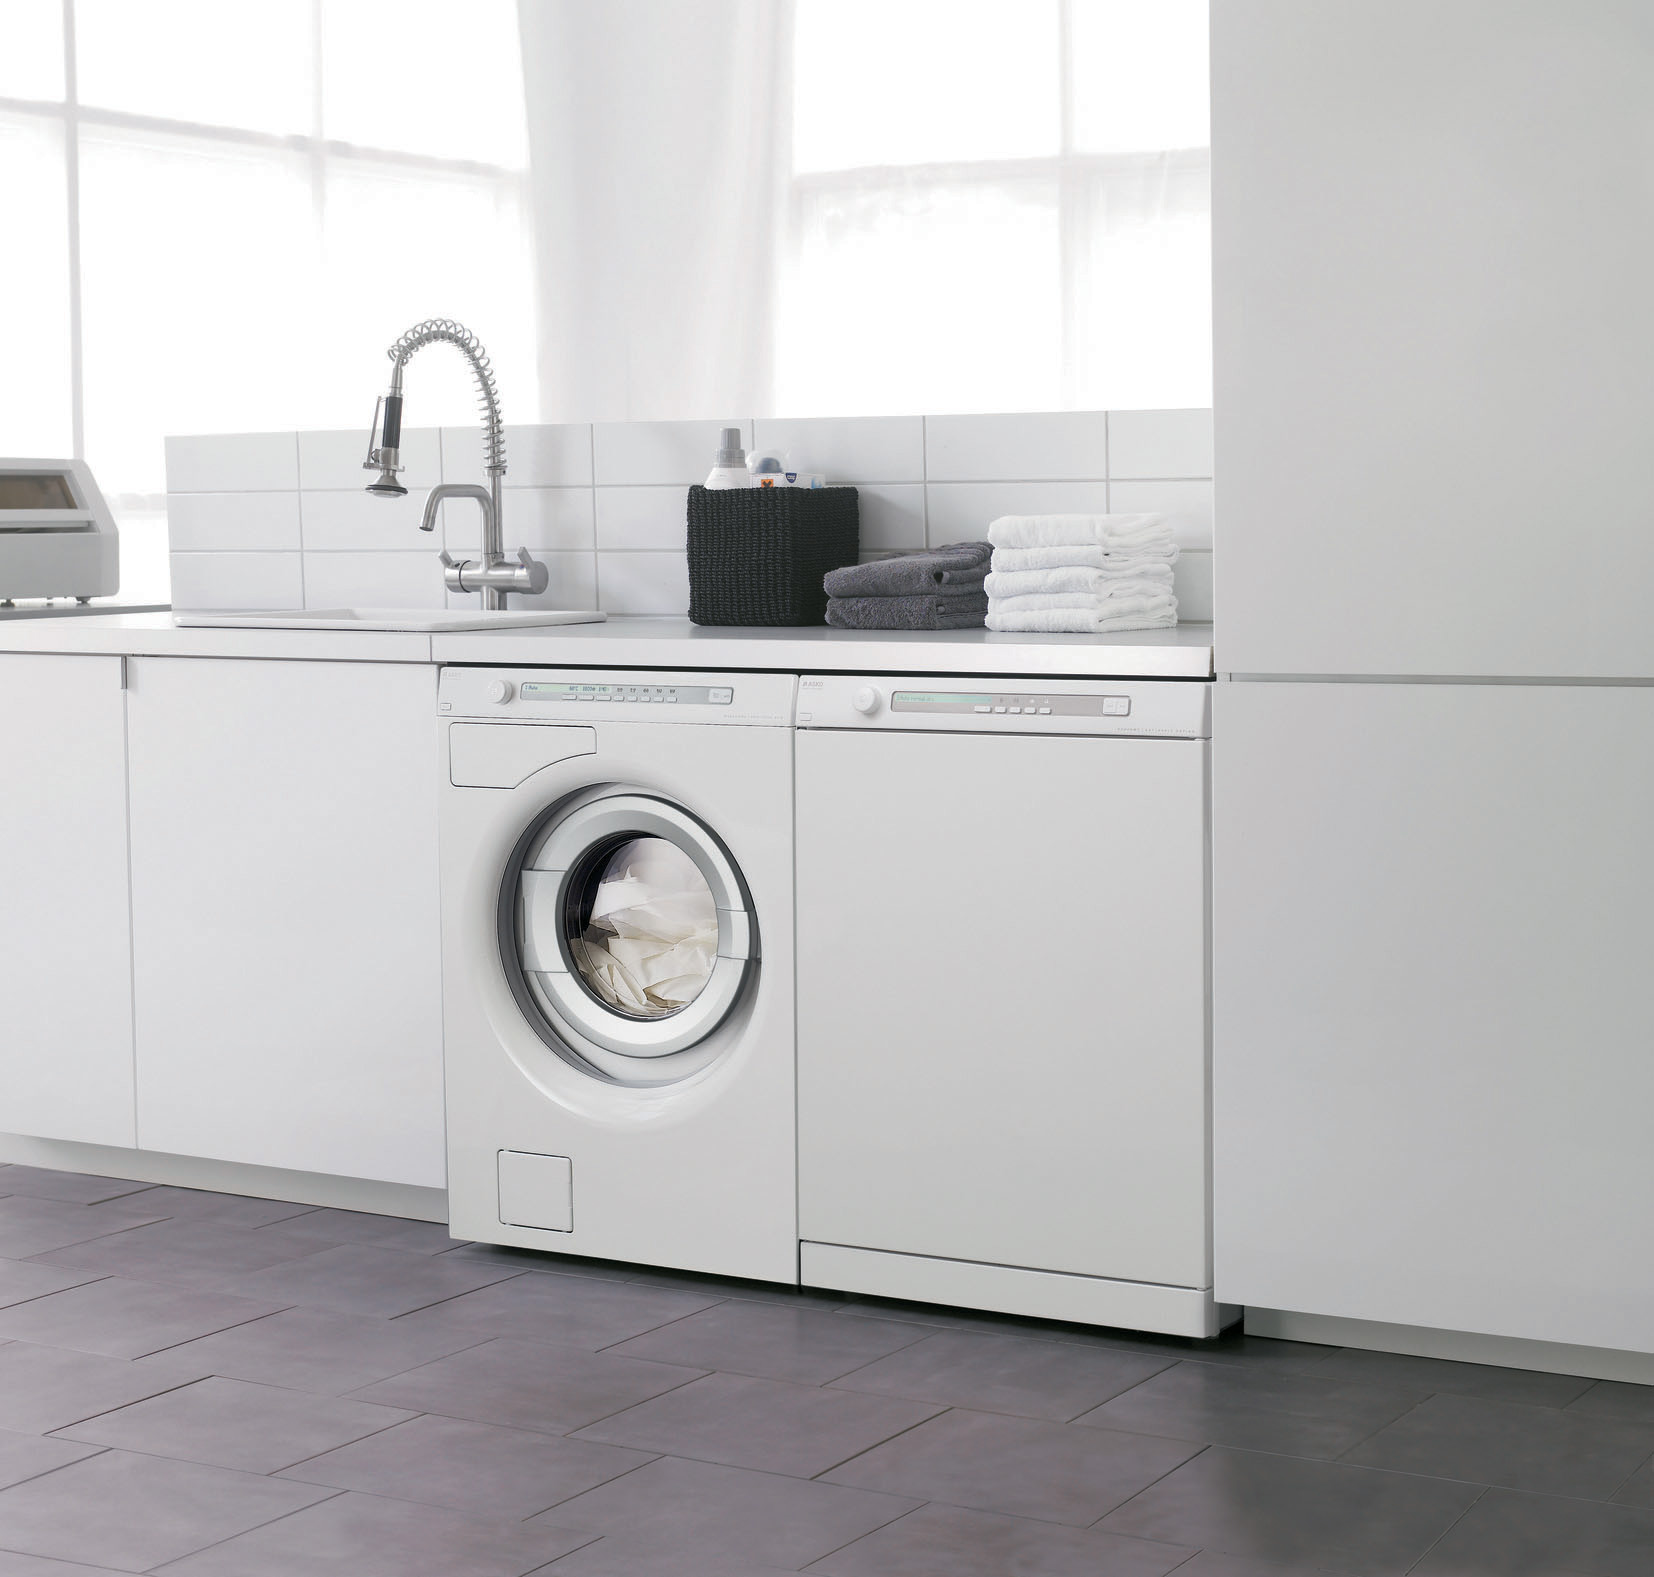 Laundry room essentials